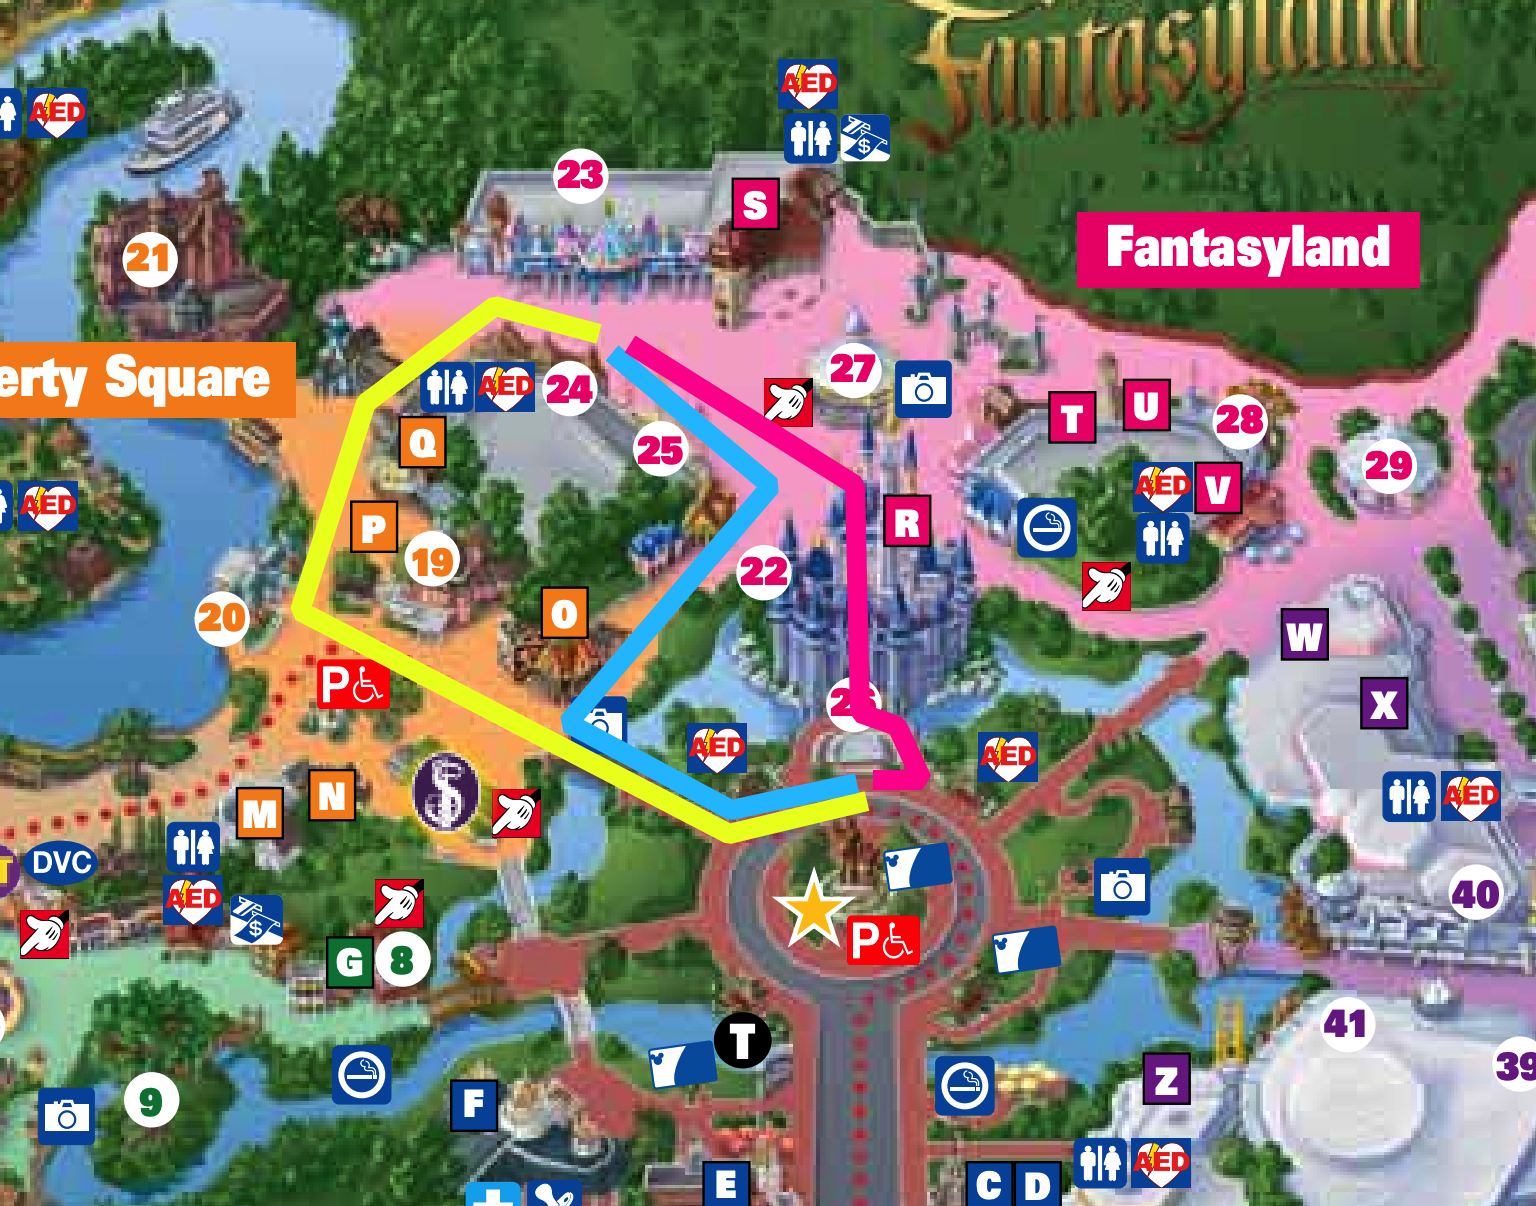 magic kingdom rope drop fanytasyland peter pan paths.png